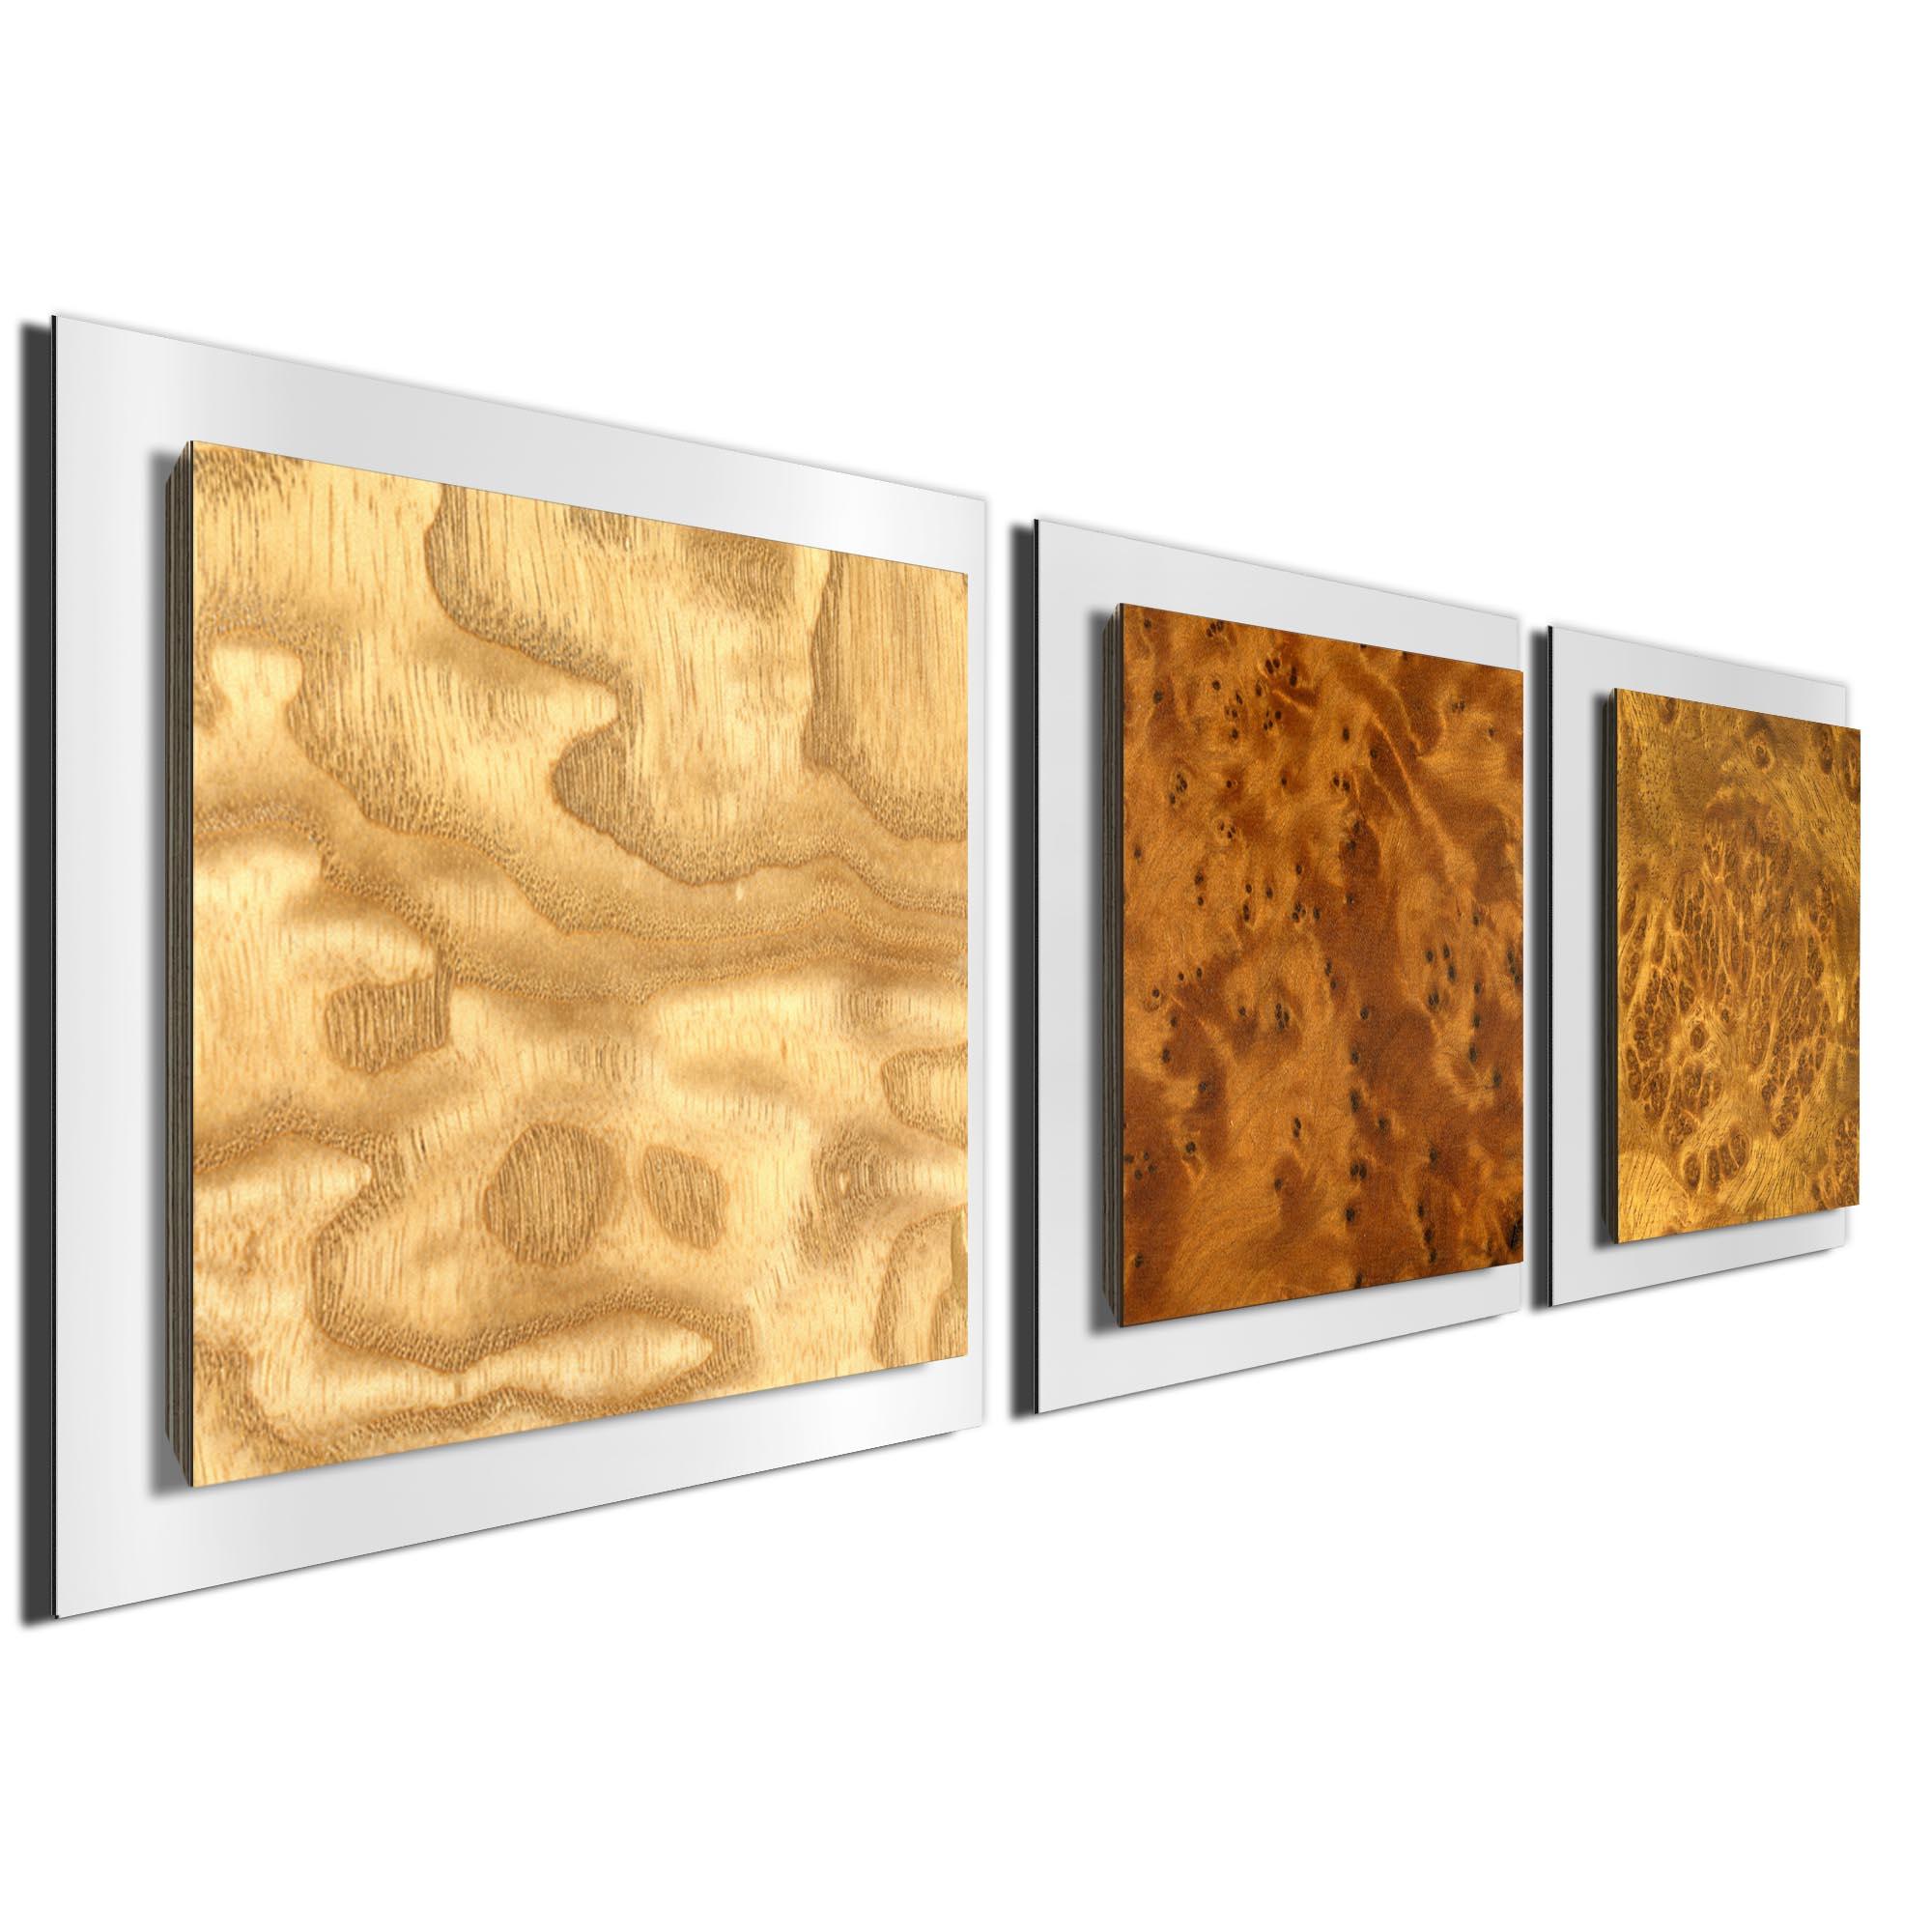 Array Burl Essence White by Jackson Wright Rustic Modern Style Wood Wall Art - Image 2